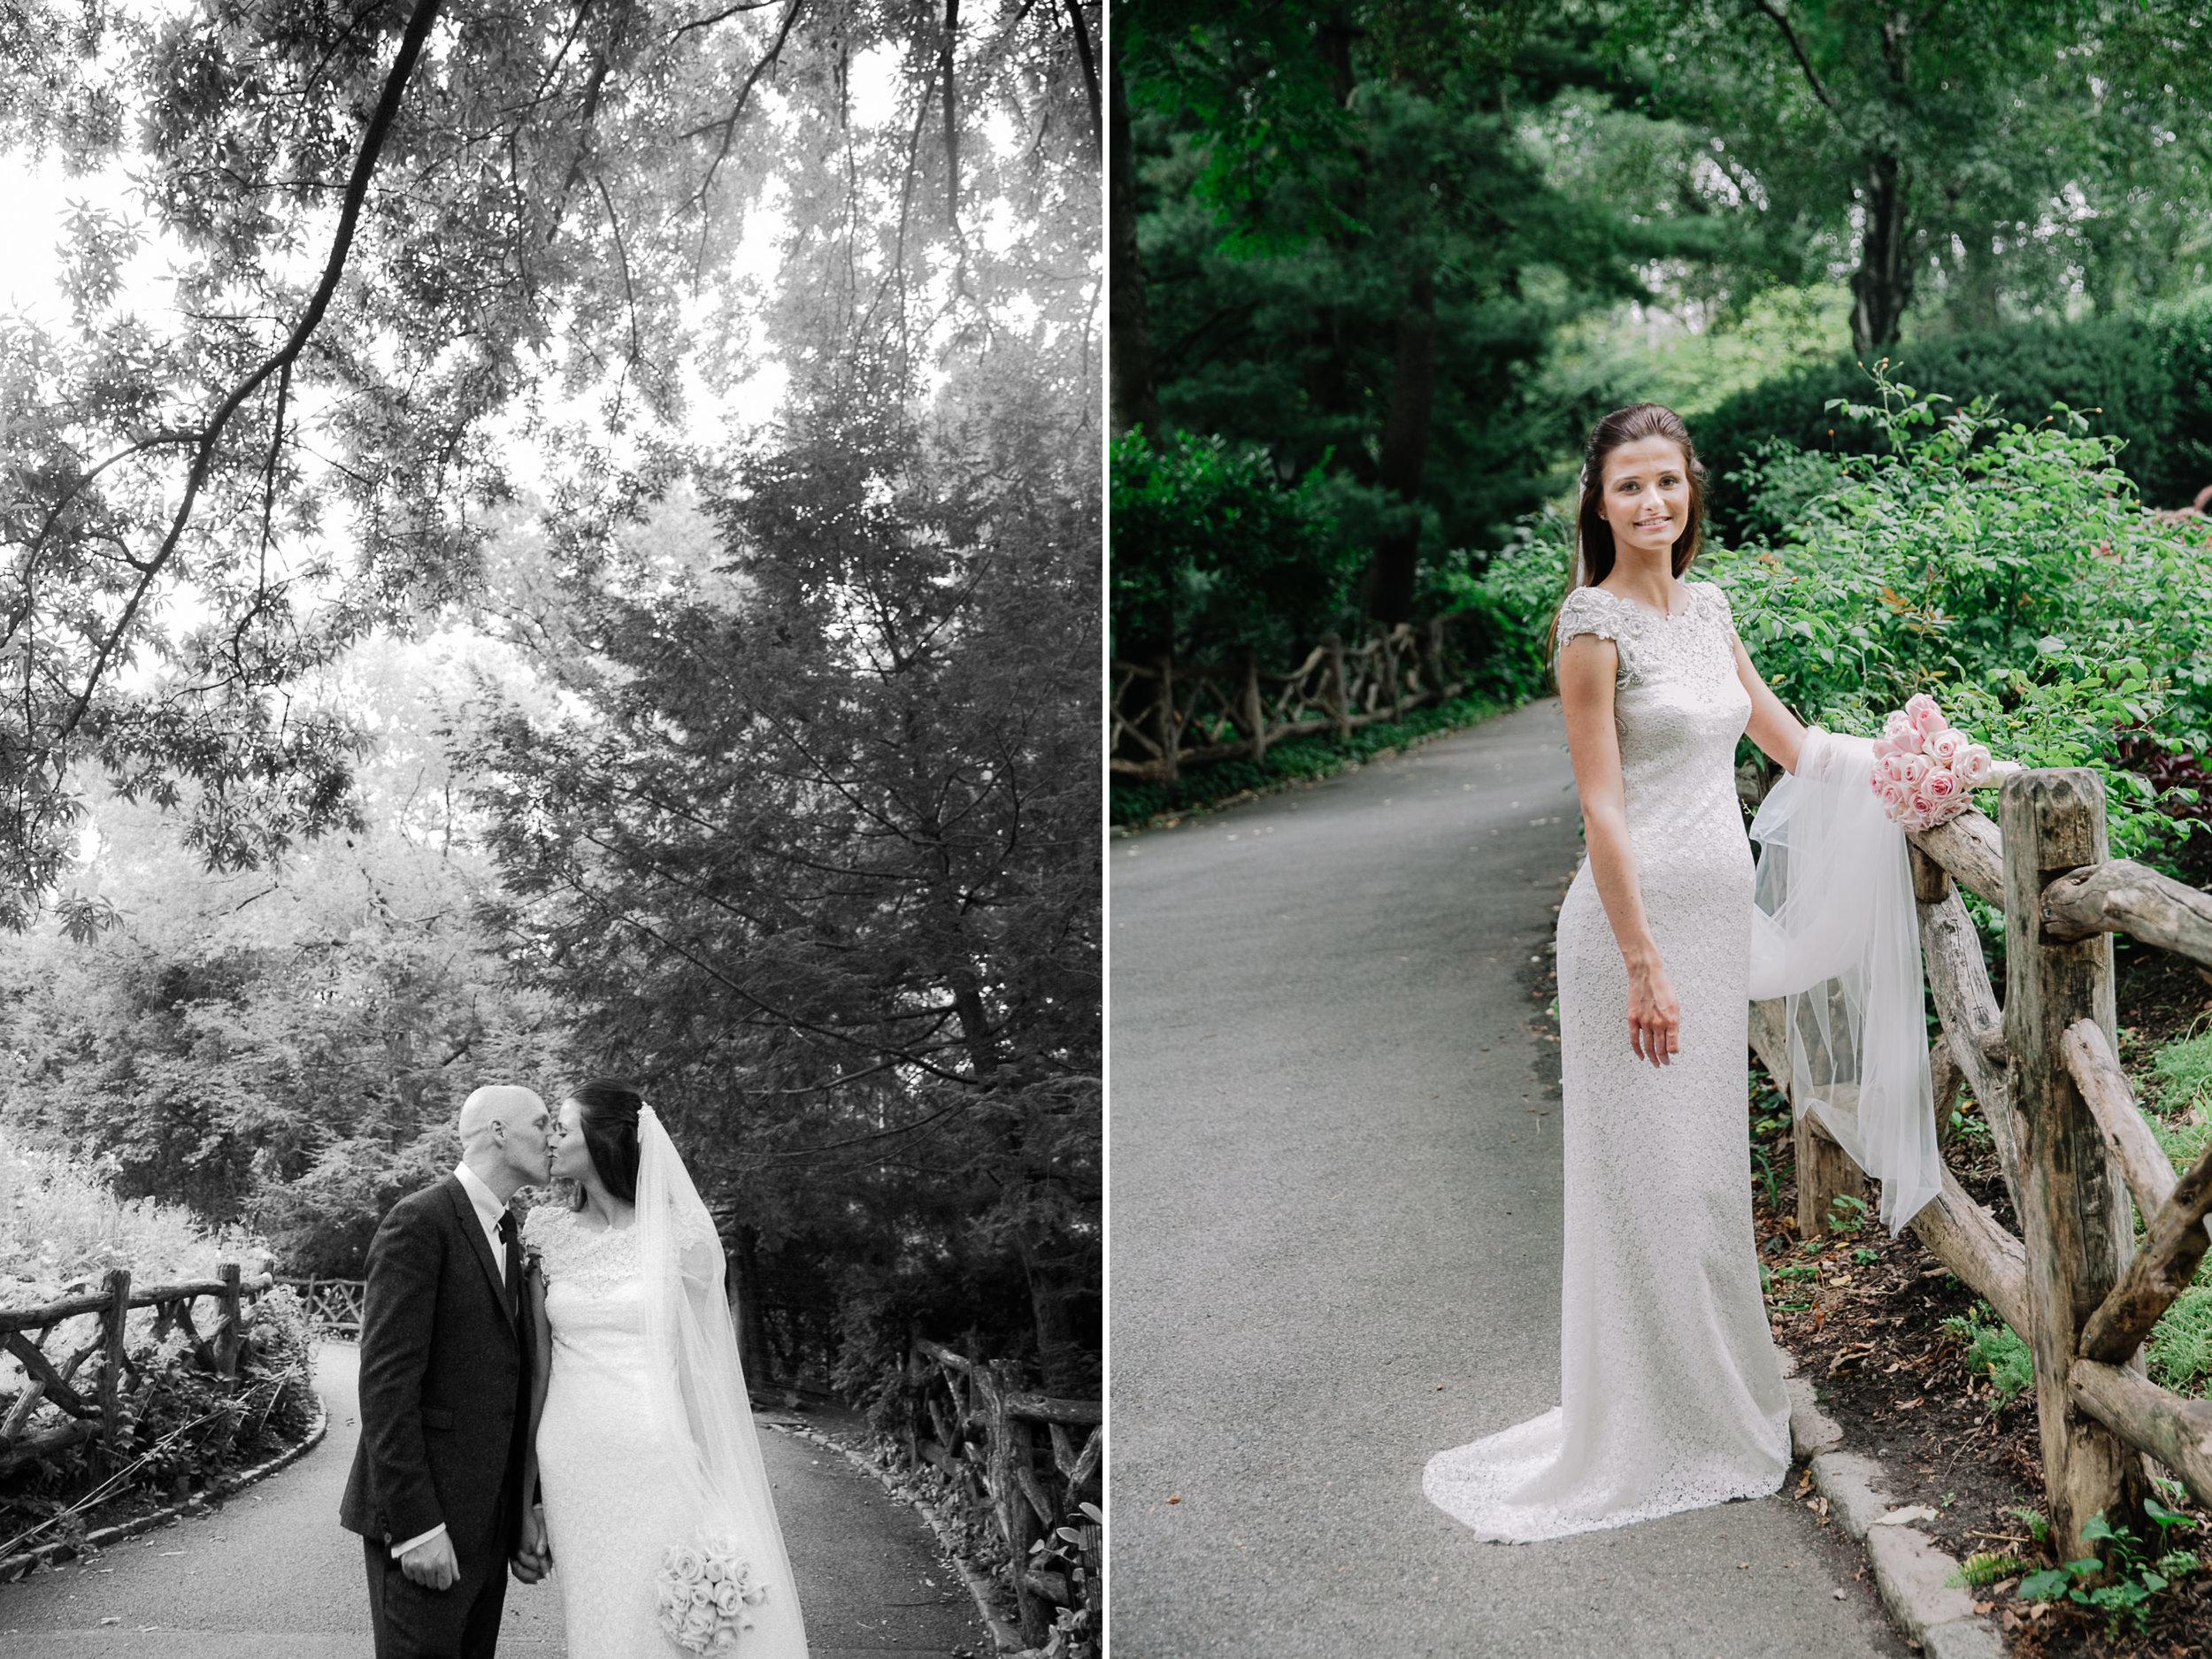 Shakespeare-garden-central-park-intimate-wedding-22-.jpg